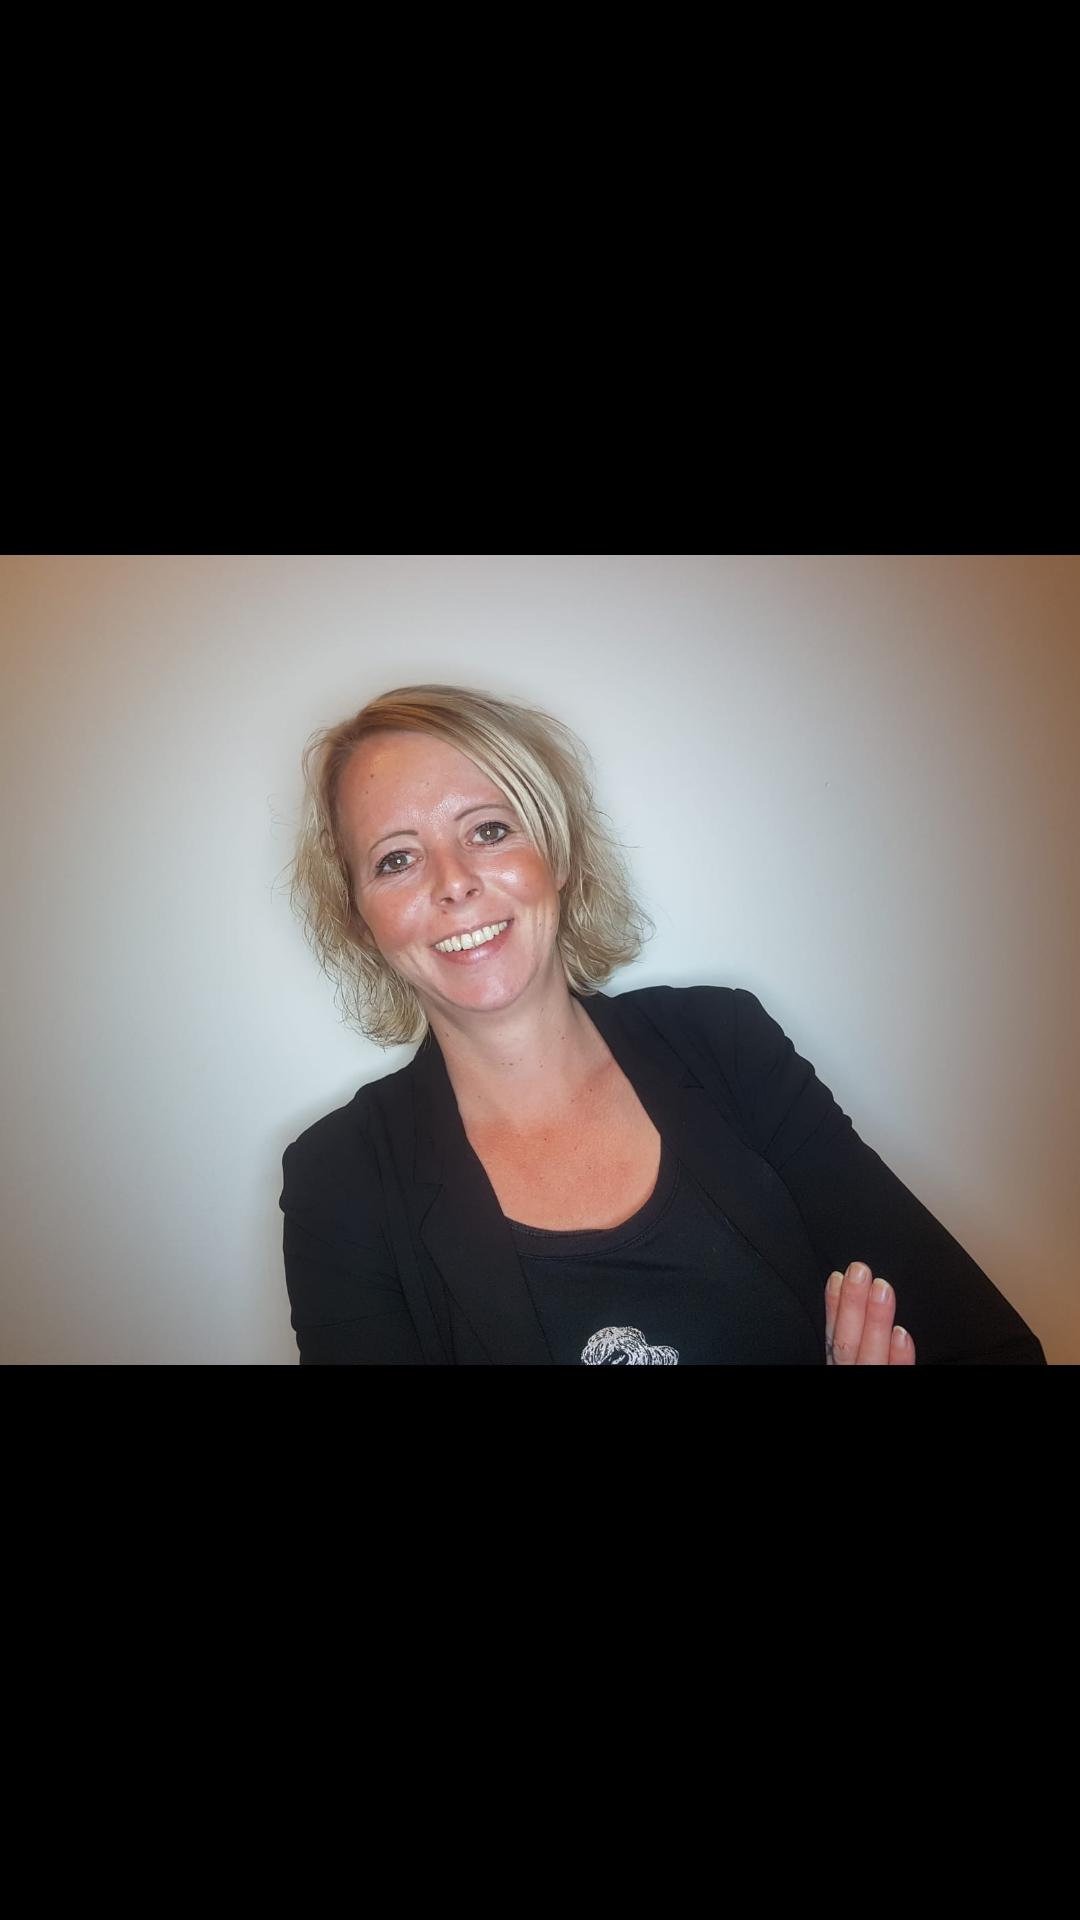 Daniella - Kapper bij Inekes Hairstyling Geervliet